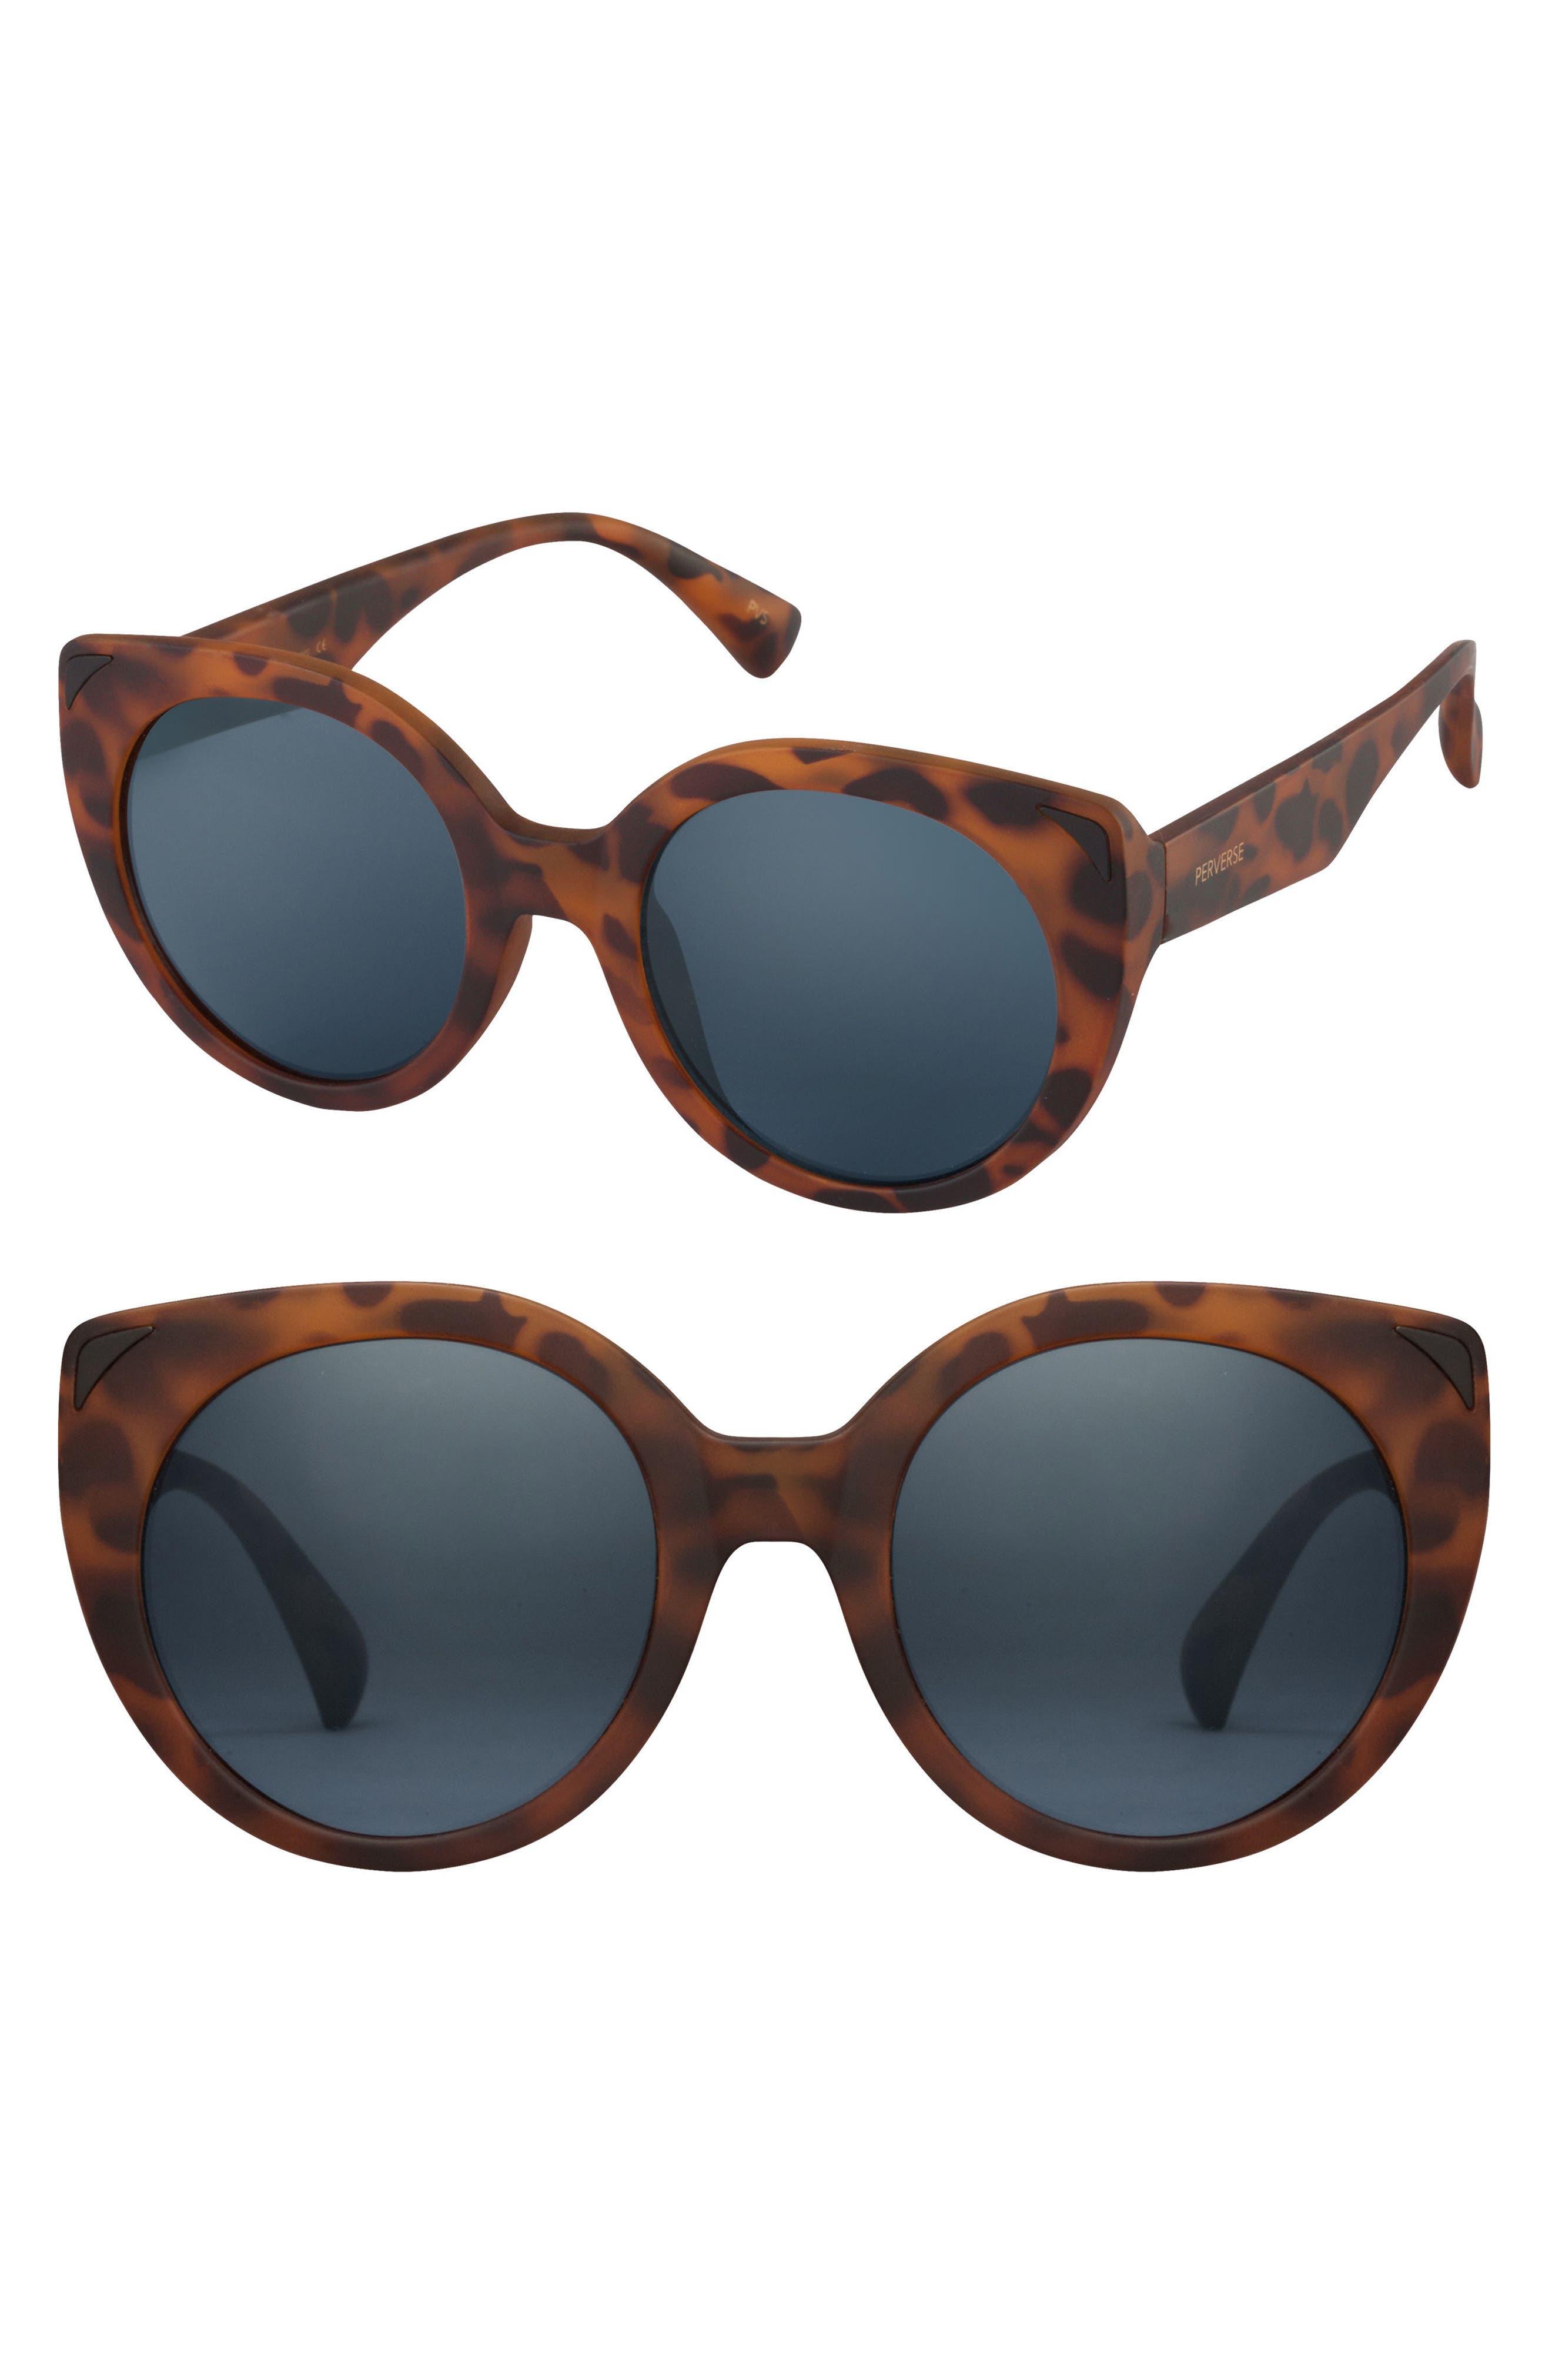 Main Image - PERVERSE 49mm Feline Round Cat Eye Sunglasses